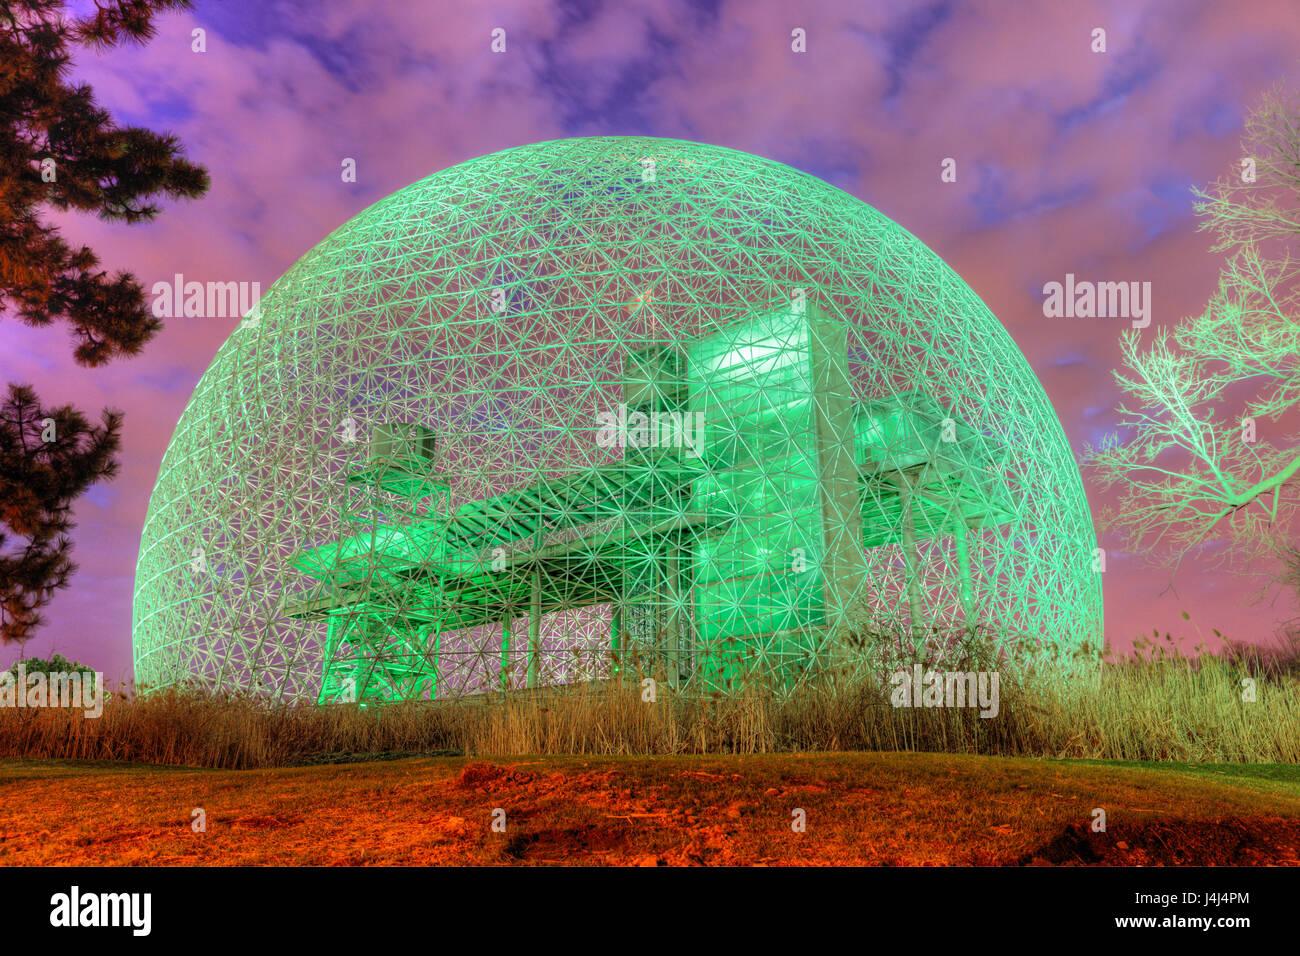 Biosphere by Buckminster Fuller, Montreal, Quebec, Canada - Stock Image